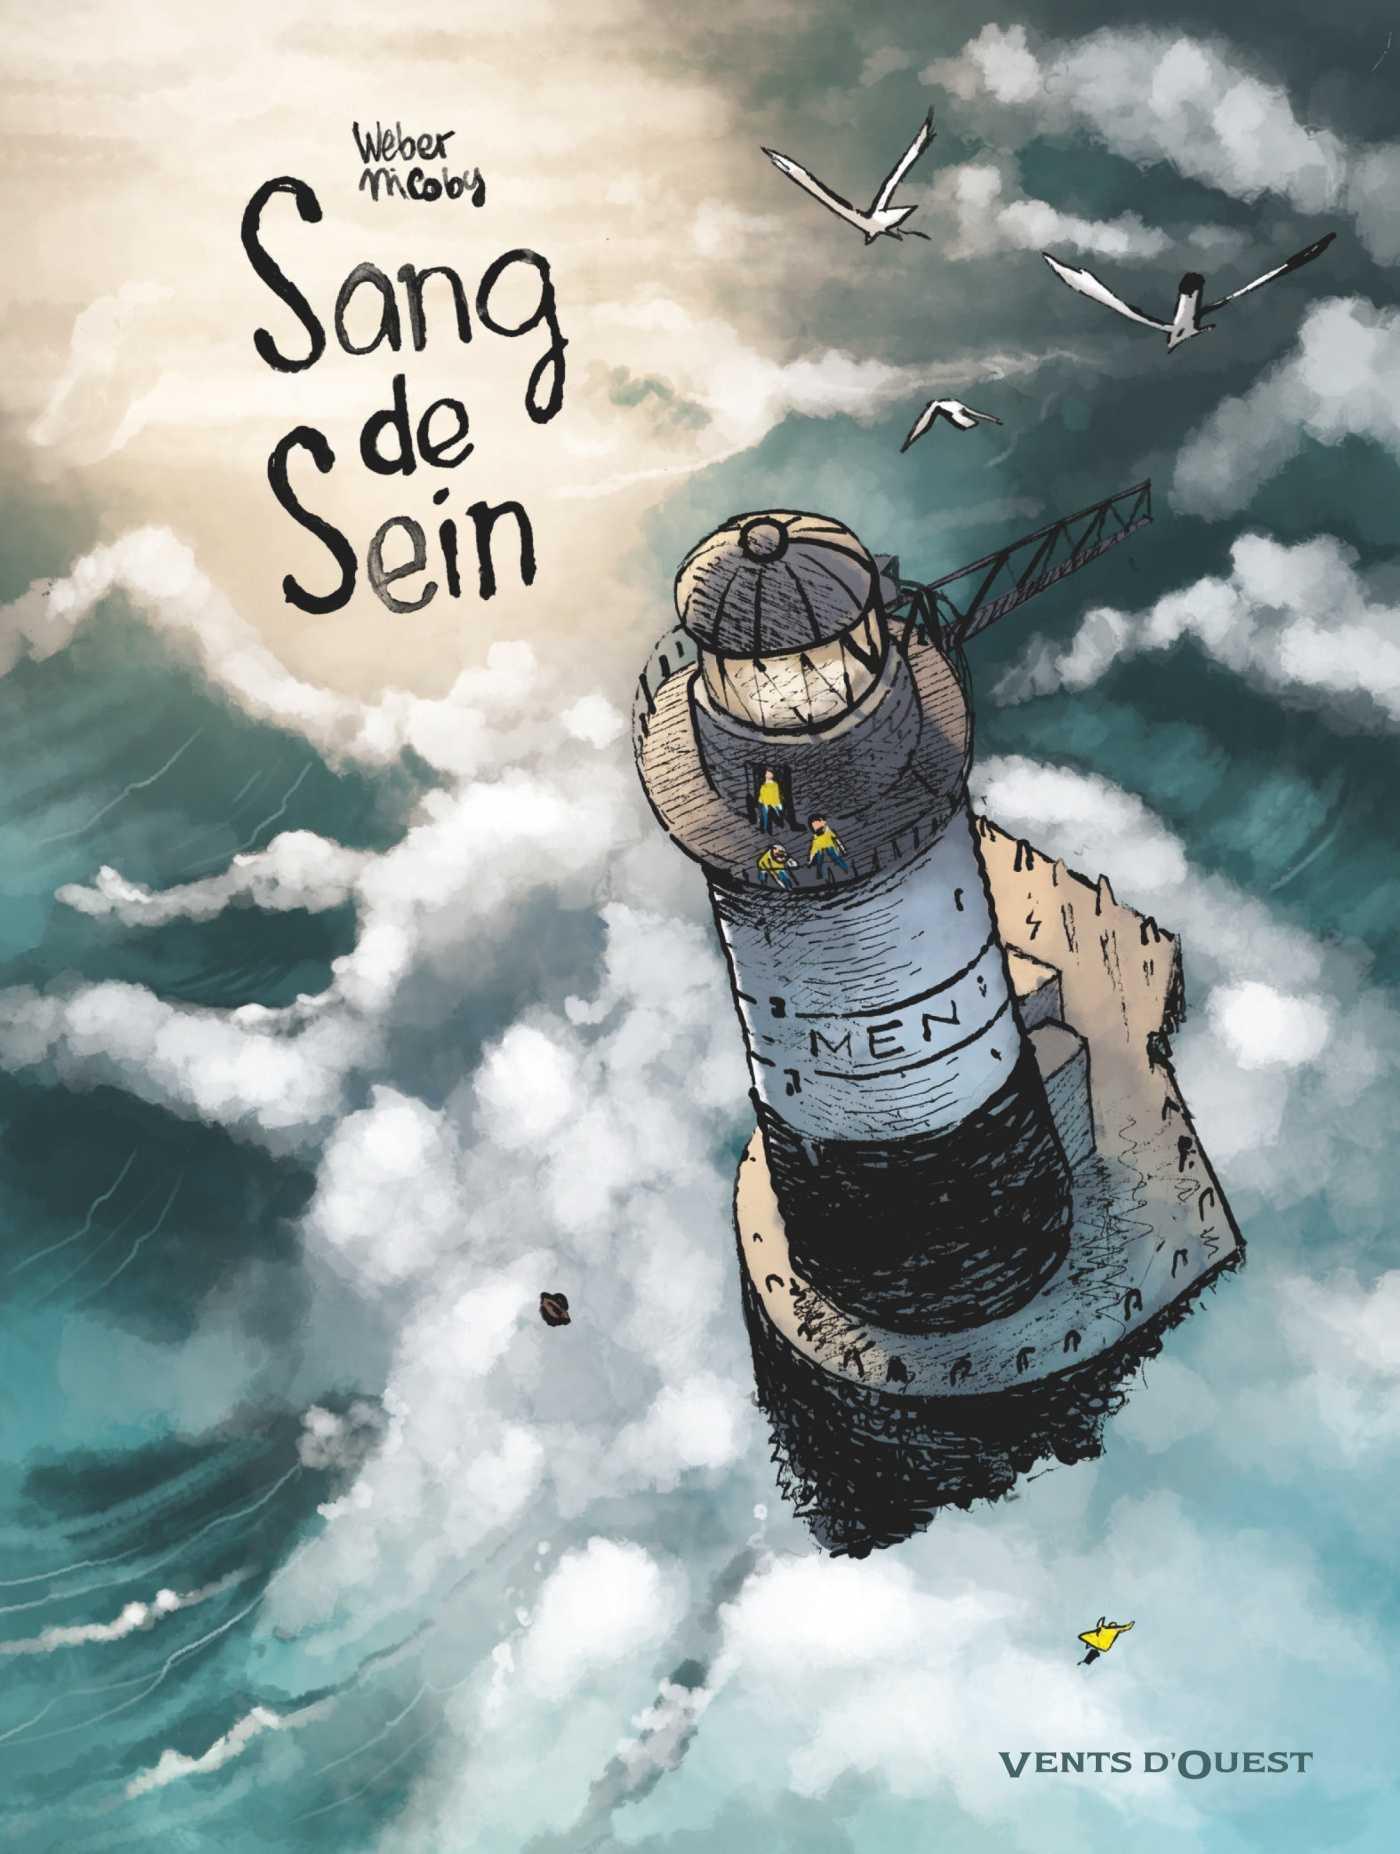 Sang de Sein, huis-clos maritime mortel